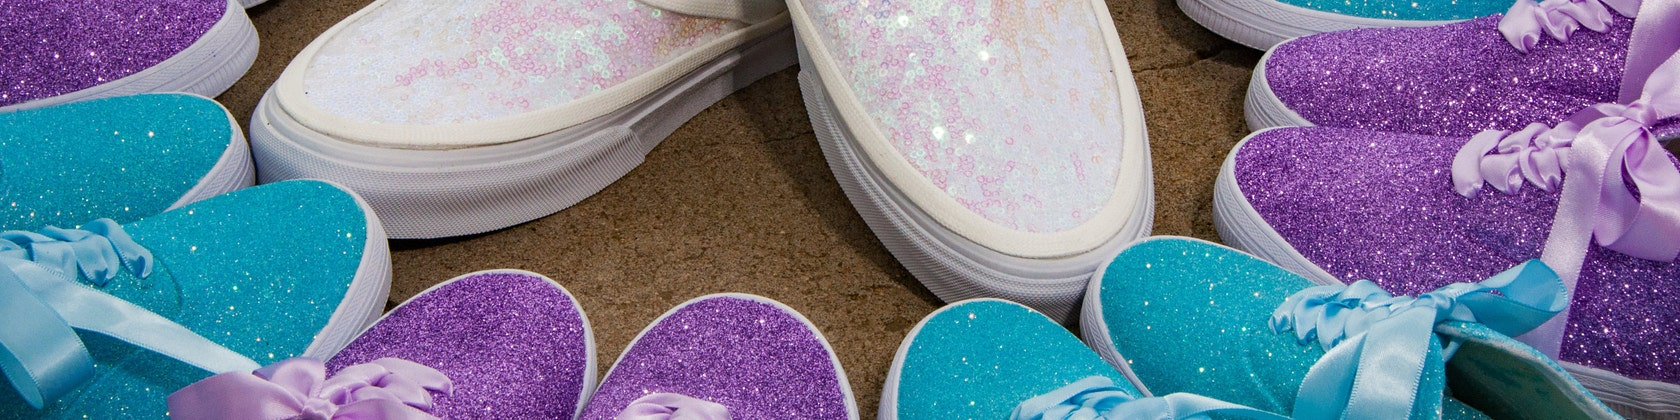 Princess Pumps: Custom Sequin Wedding Shoes & von princesspumps